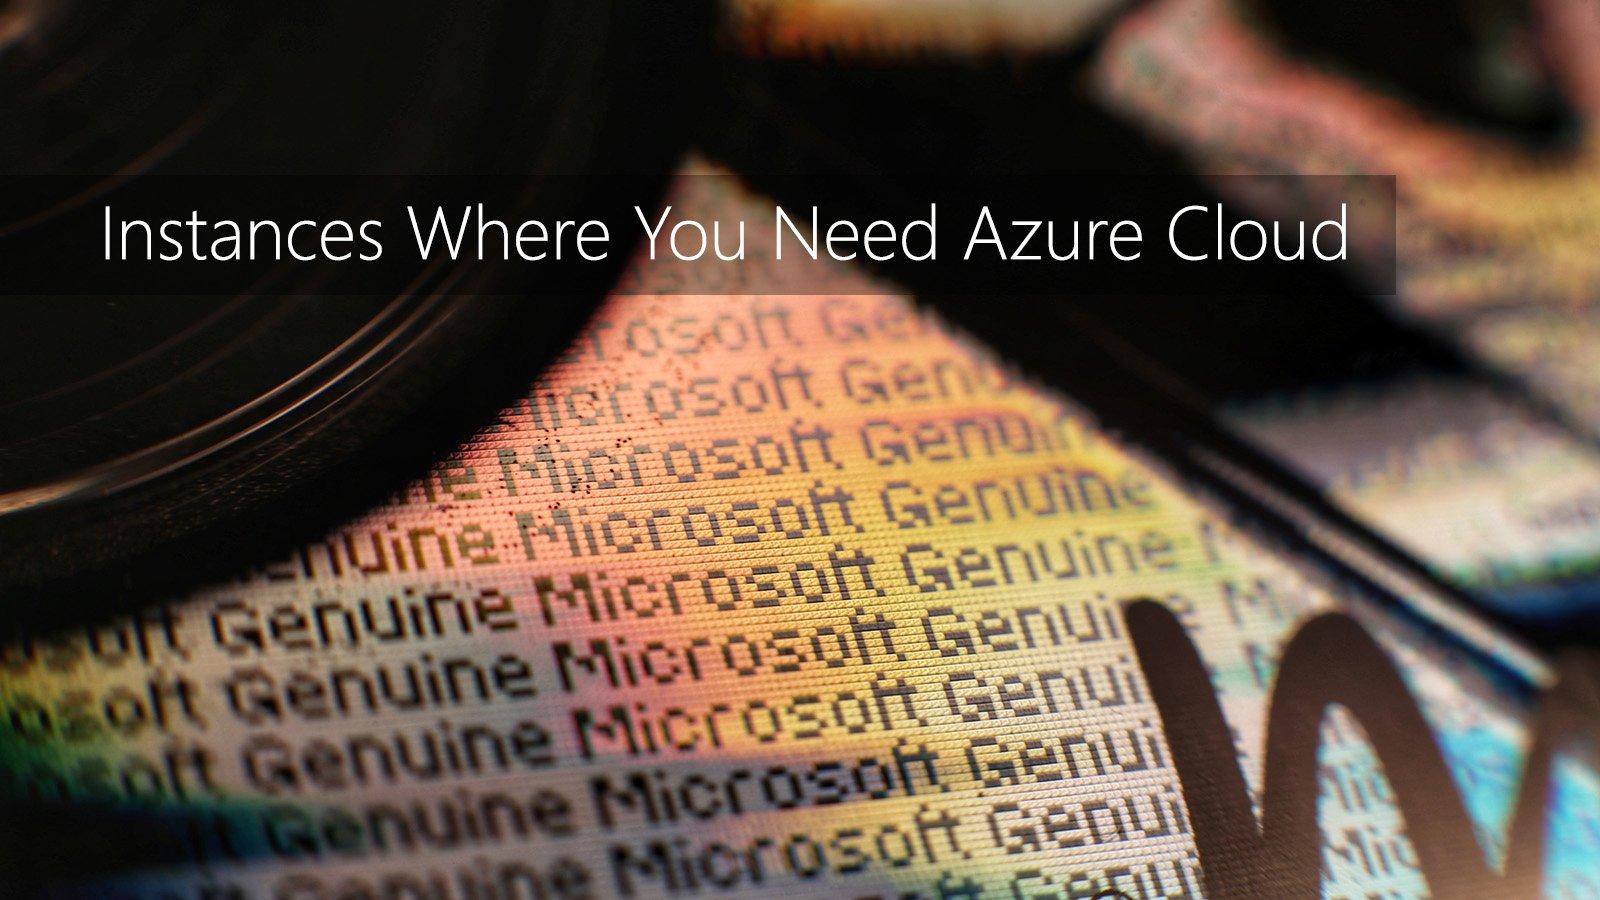 Instances Where You Need Azure Cloud